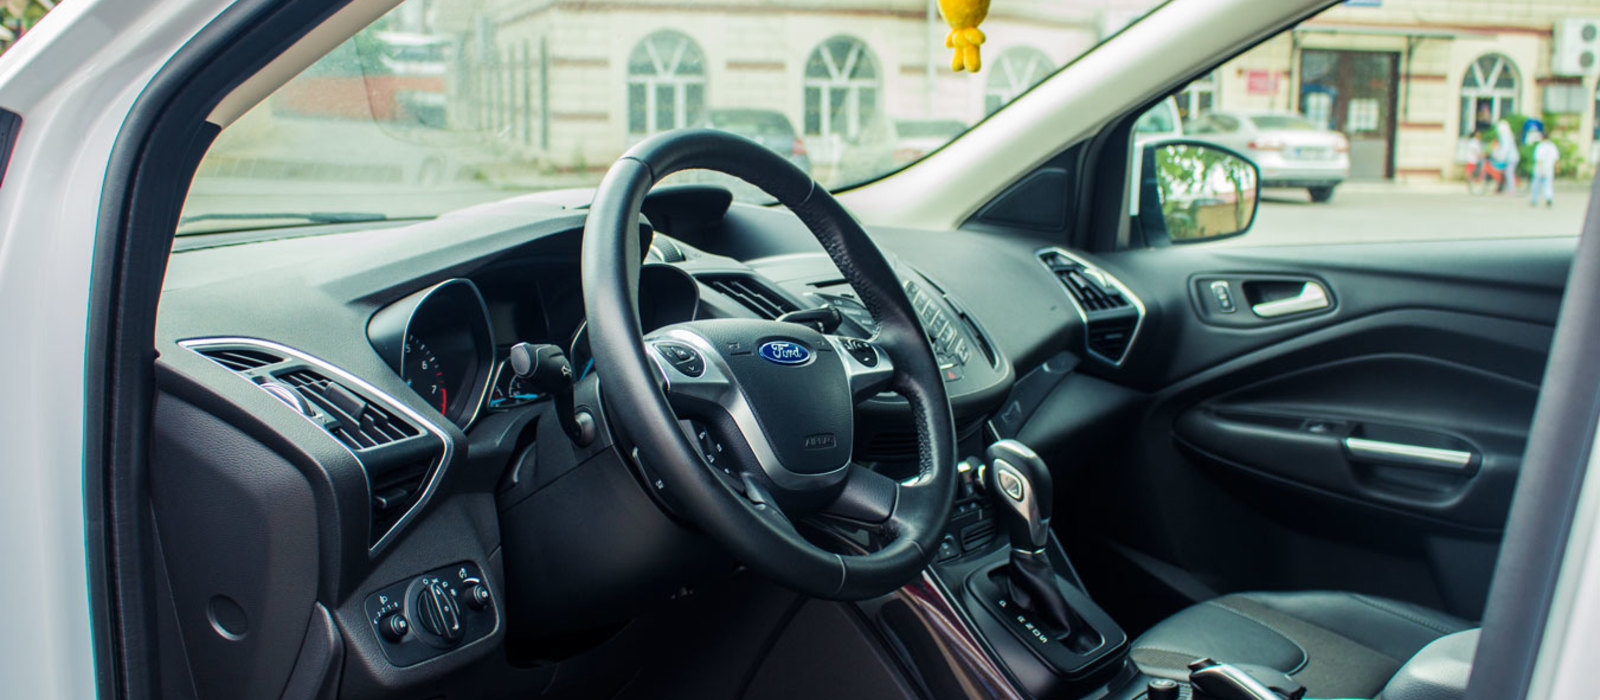 ikinci el araba 2014 Ford Kuga 1.6 EcoBoost Titanium Benzin Otomatik 14000 KM 9